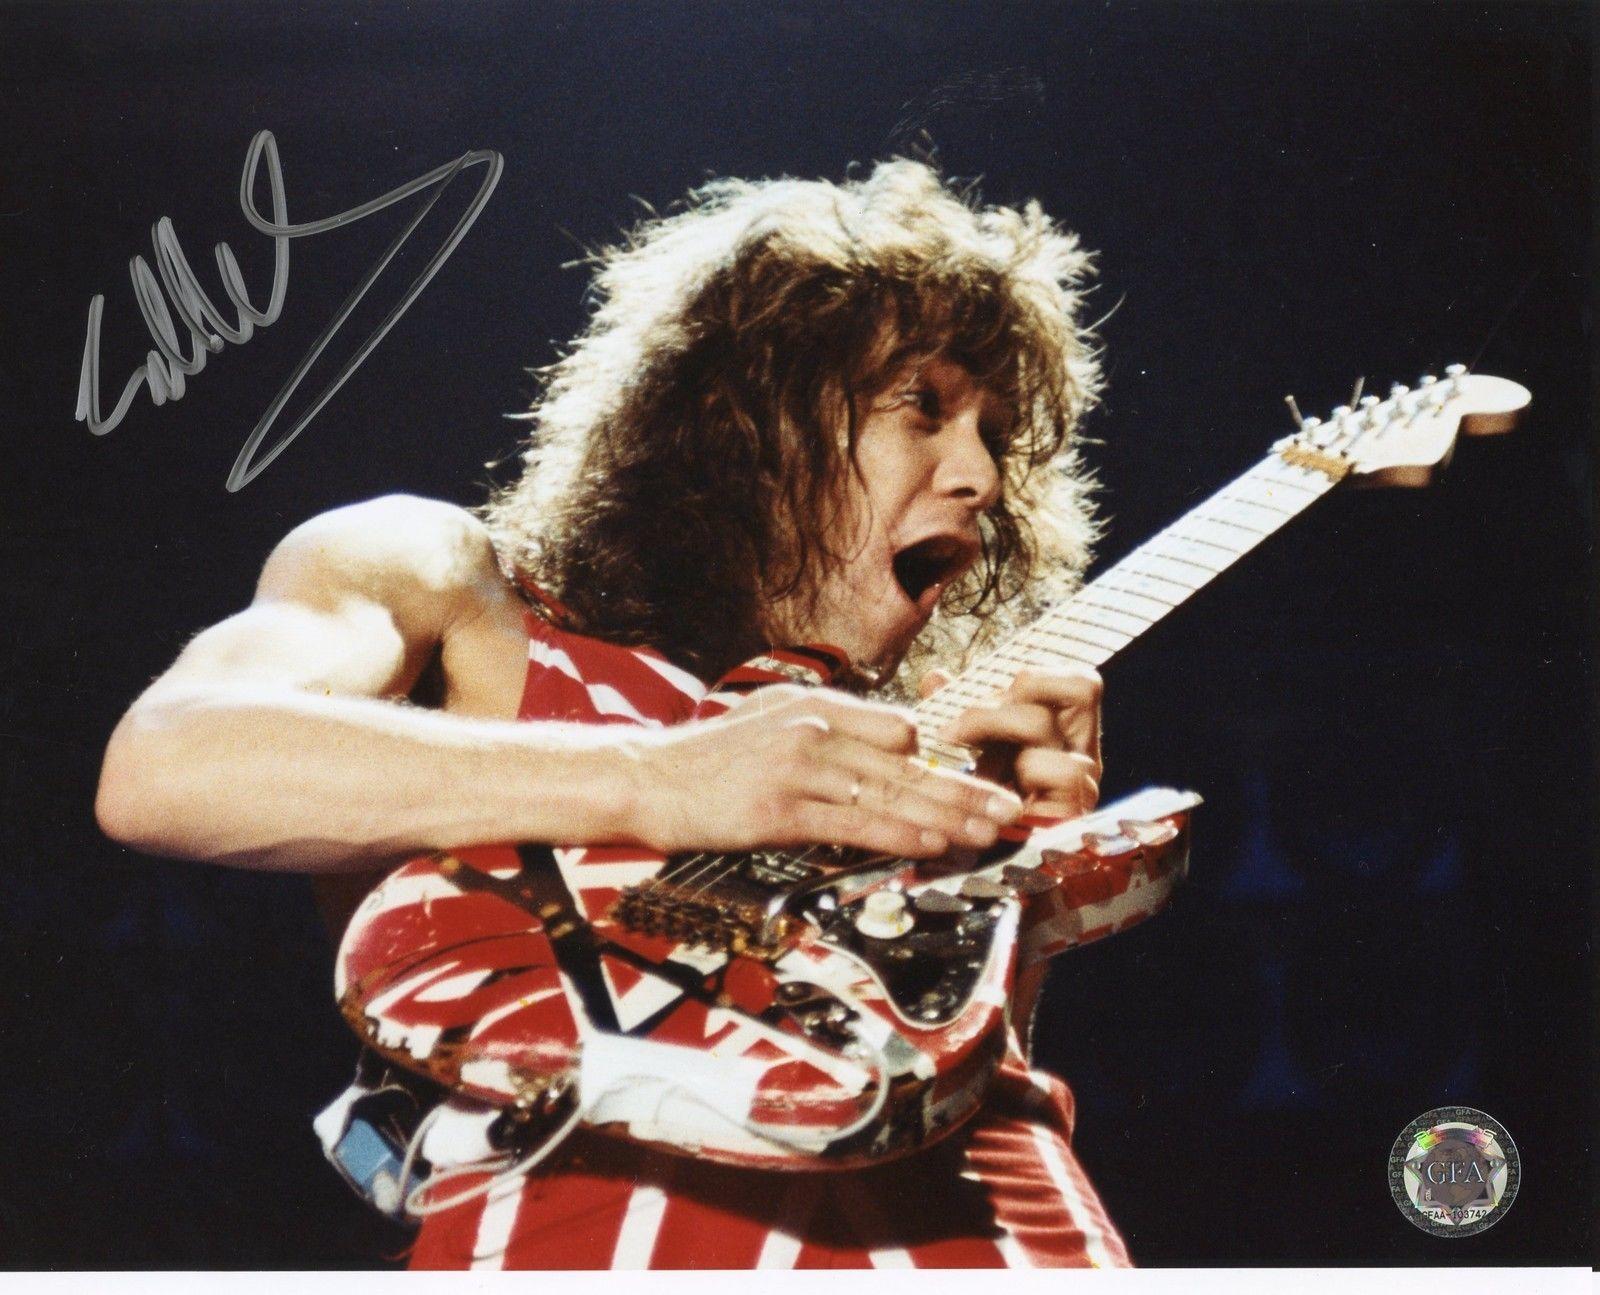 Eddie Van Halen 8x10 Signed Autographed Eruption GFA COA